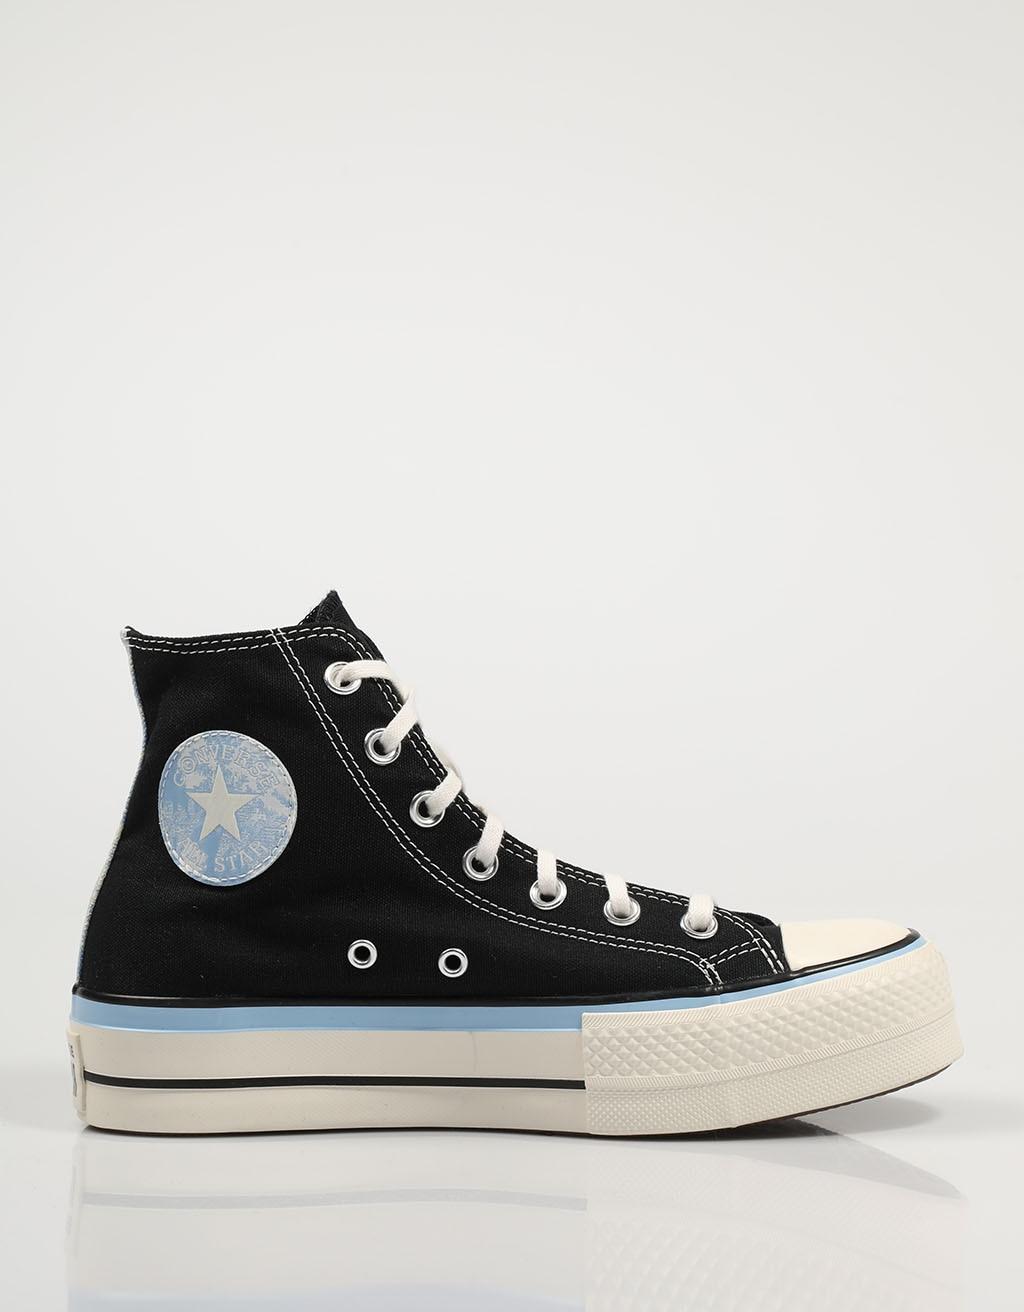 CONVERSE ZAPATILLAS CTAS LIFT BLACK/BLUE 571582C Negro Lona Mujer – Black SNEAKERS Woman Shoes Casual Fashion 76500